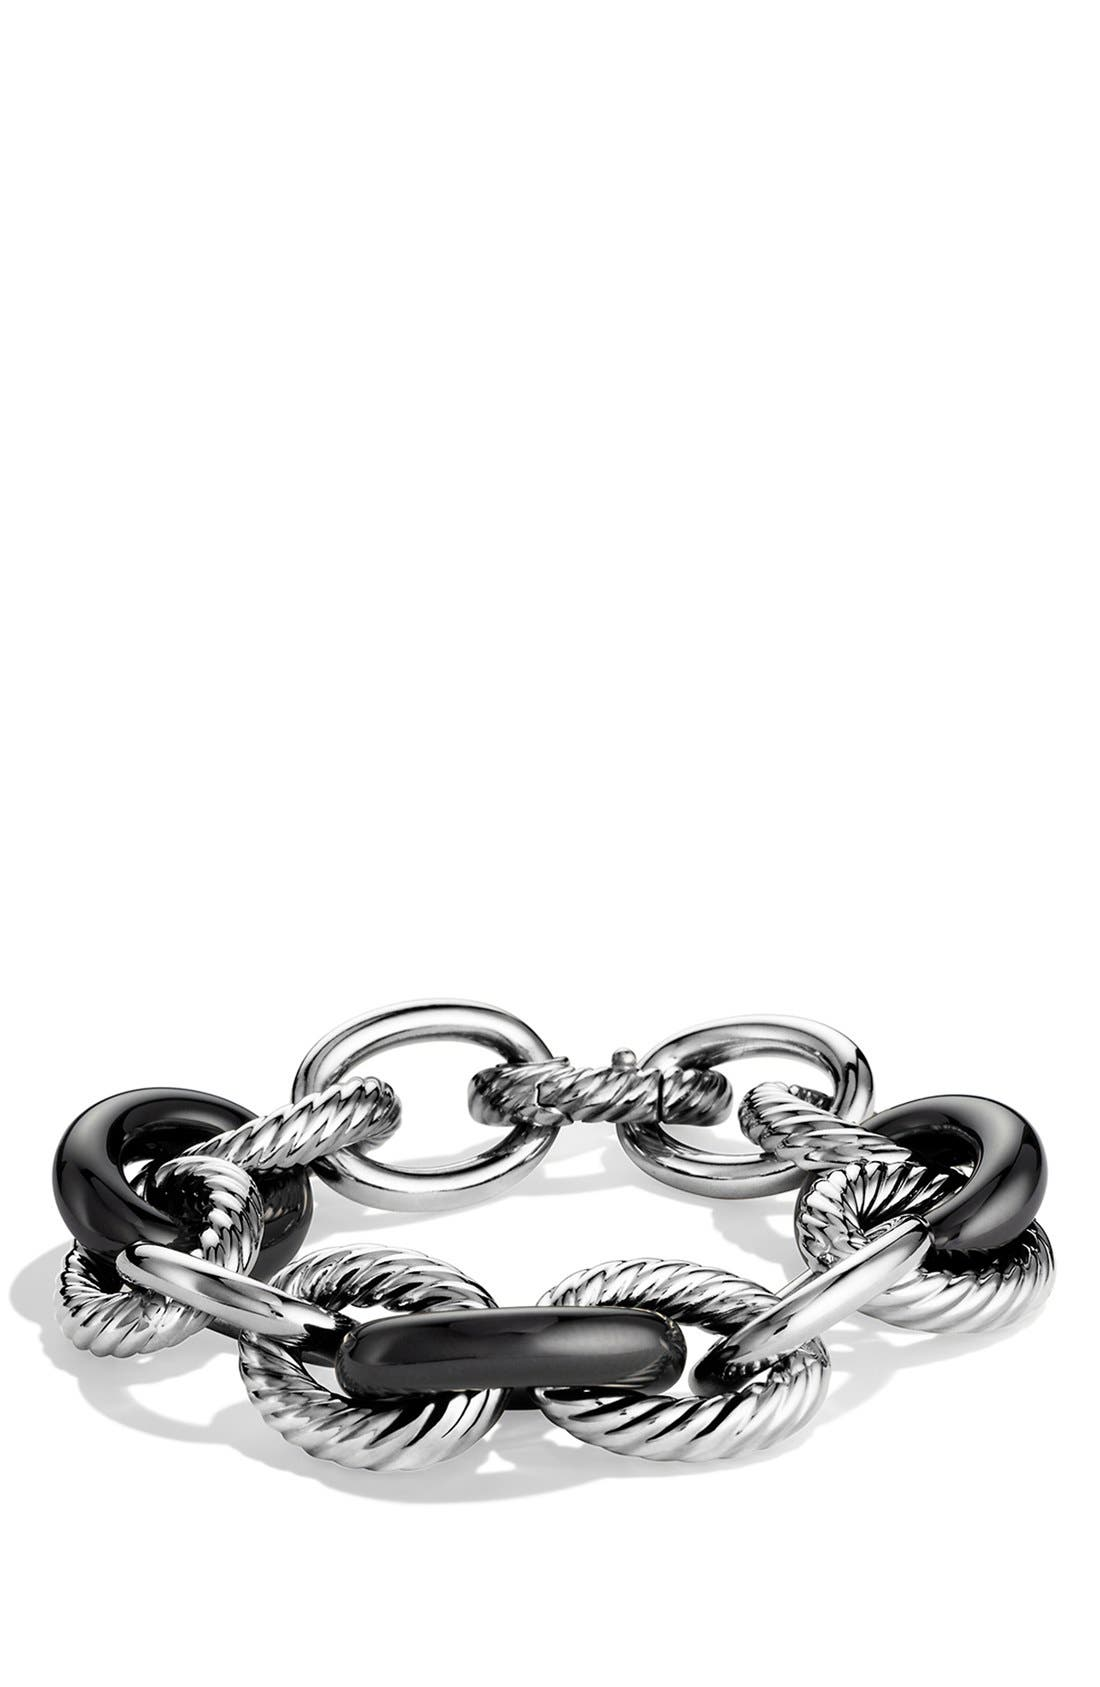 David Yurman 'Oval' Extra-Large Ceramic Link Bracelet